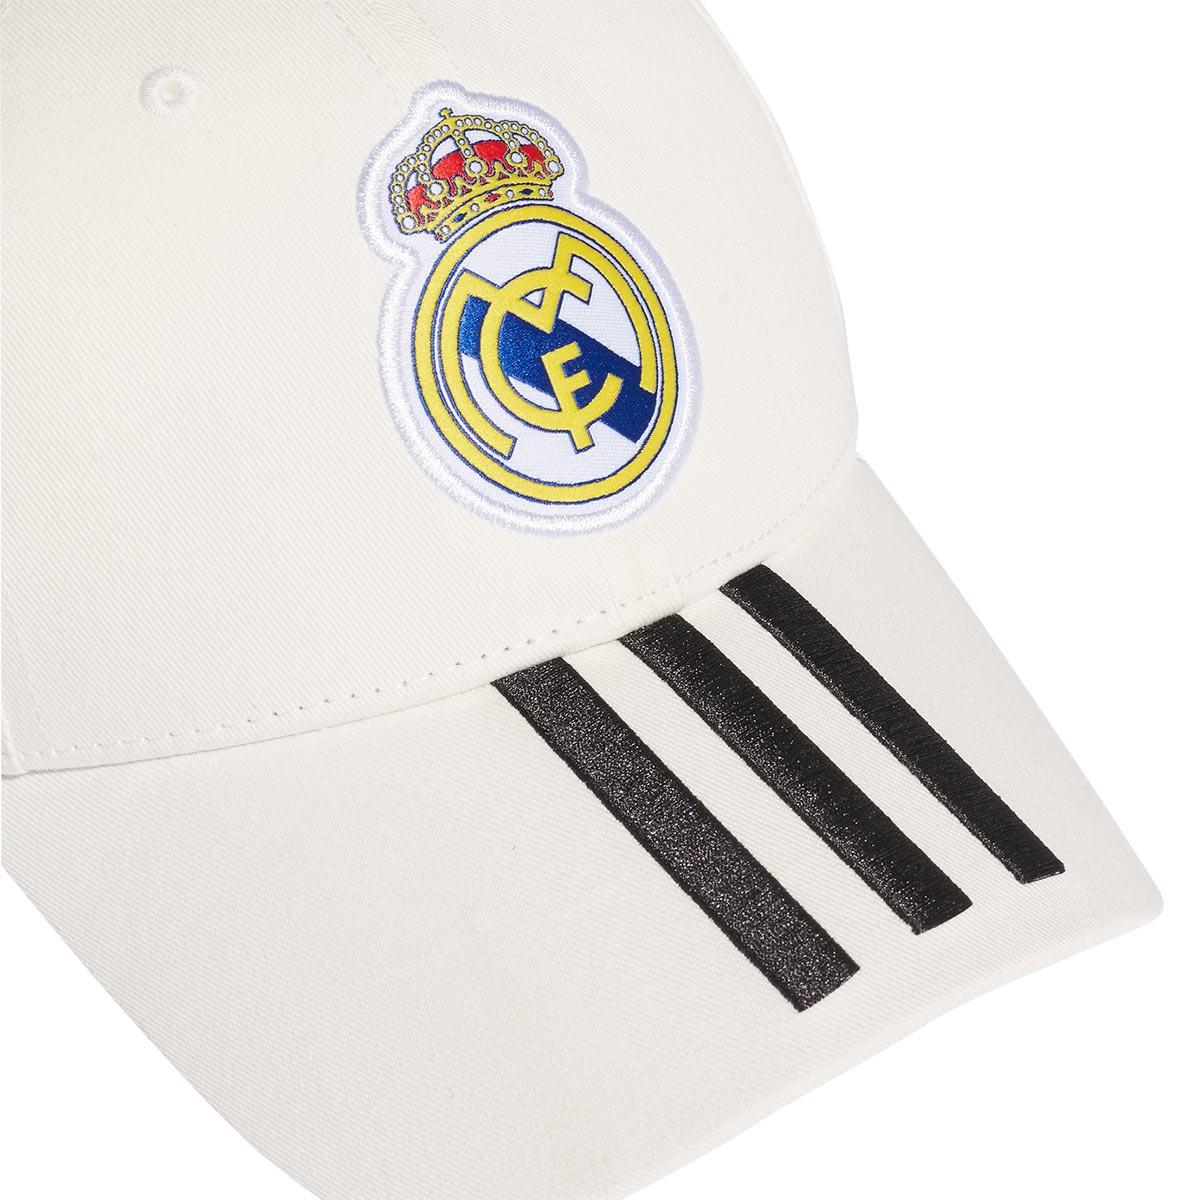 bdcea3d9ba29e Cap adidas Real Madrid 3S 2018-2019 White-Black - Leaked soccer